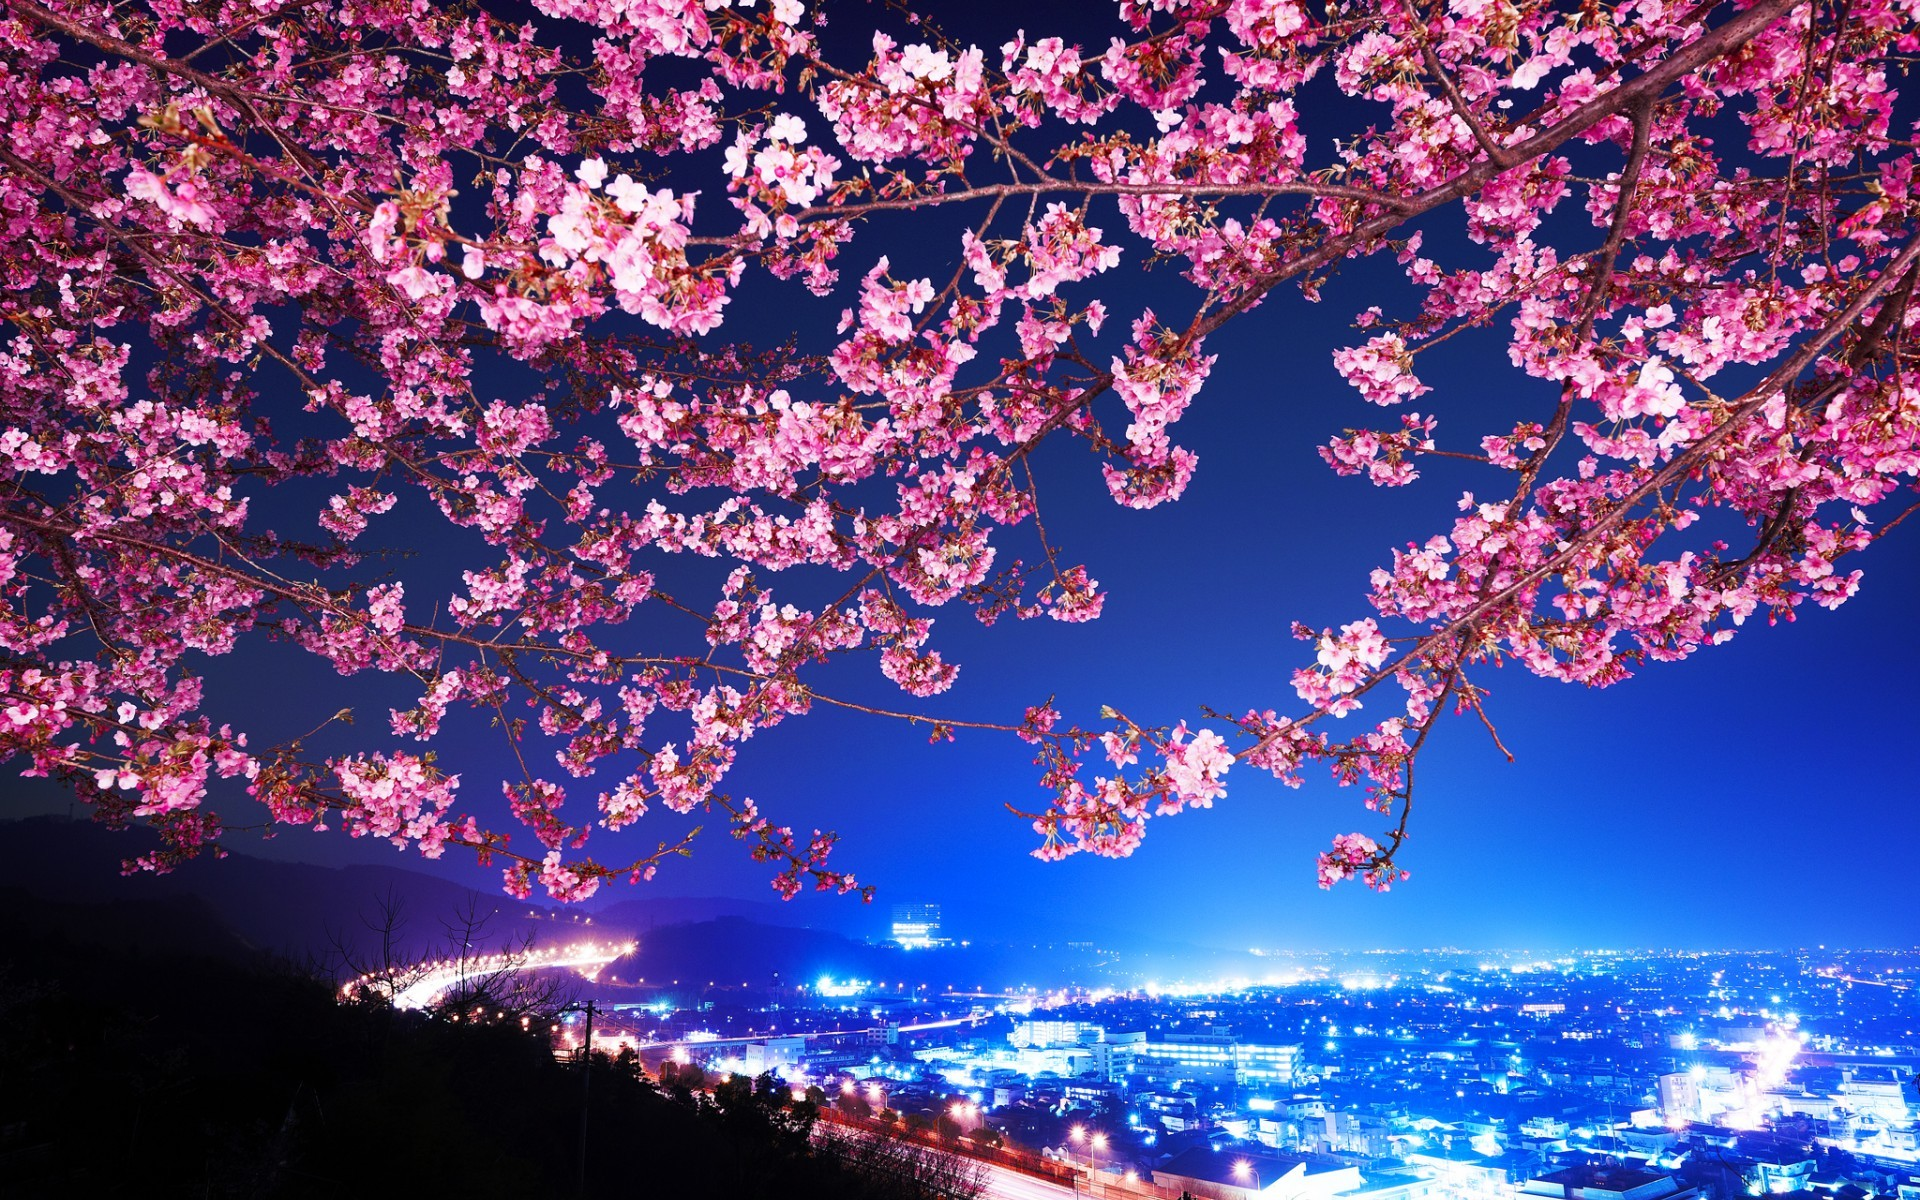 Japan City Wallpapers Desktop : City Wallpaper – Arunnath.com